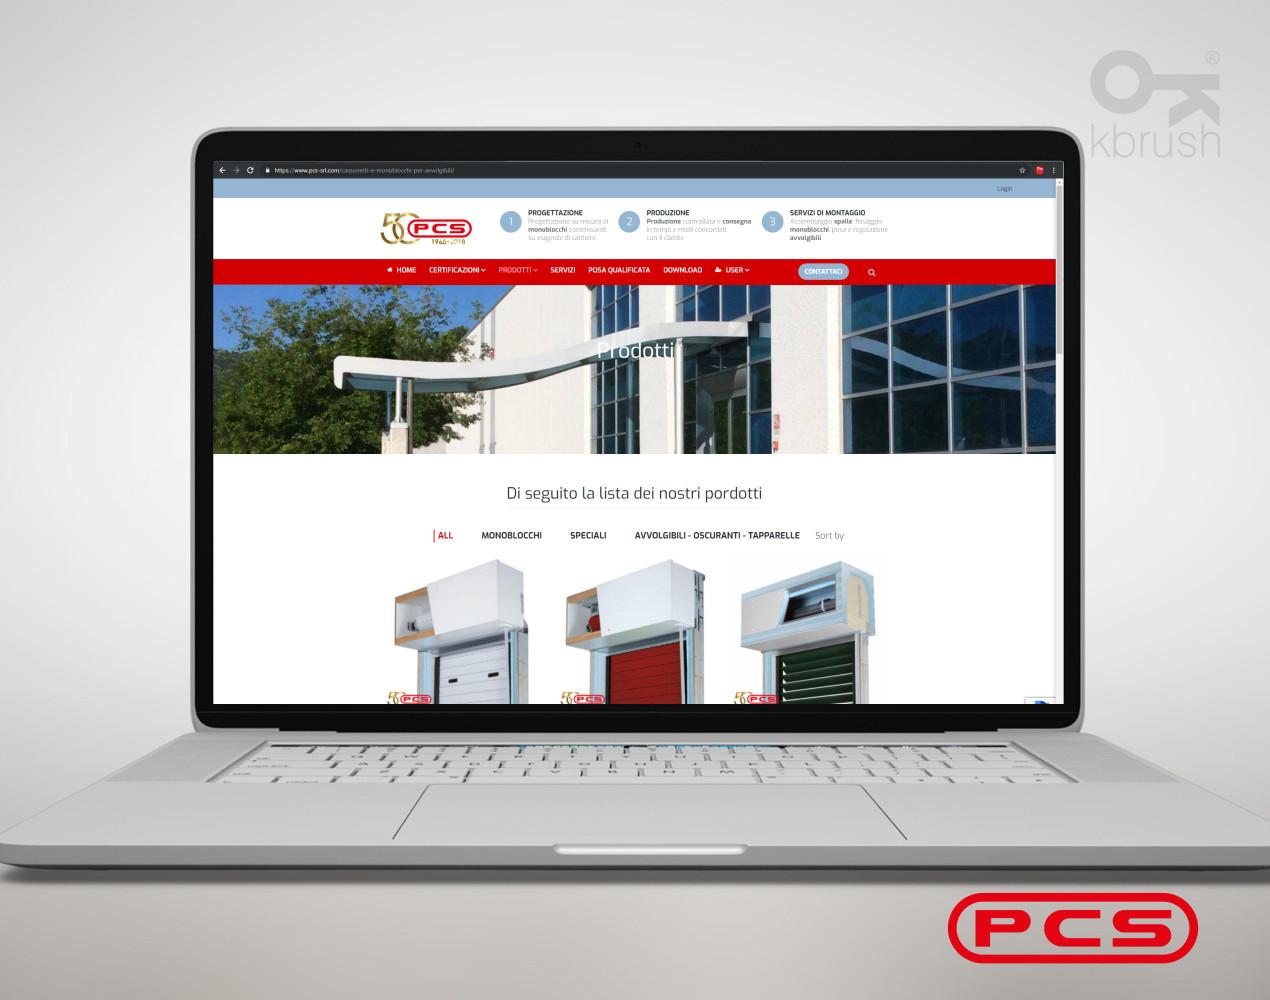 sito web PCS 2 – Kbrush Studio grafico